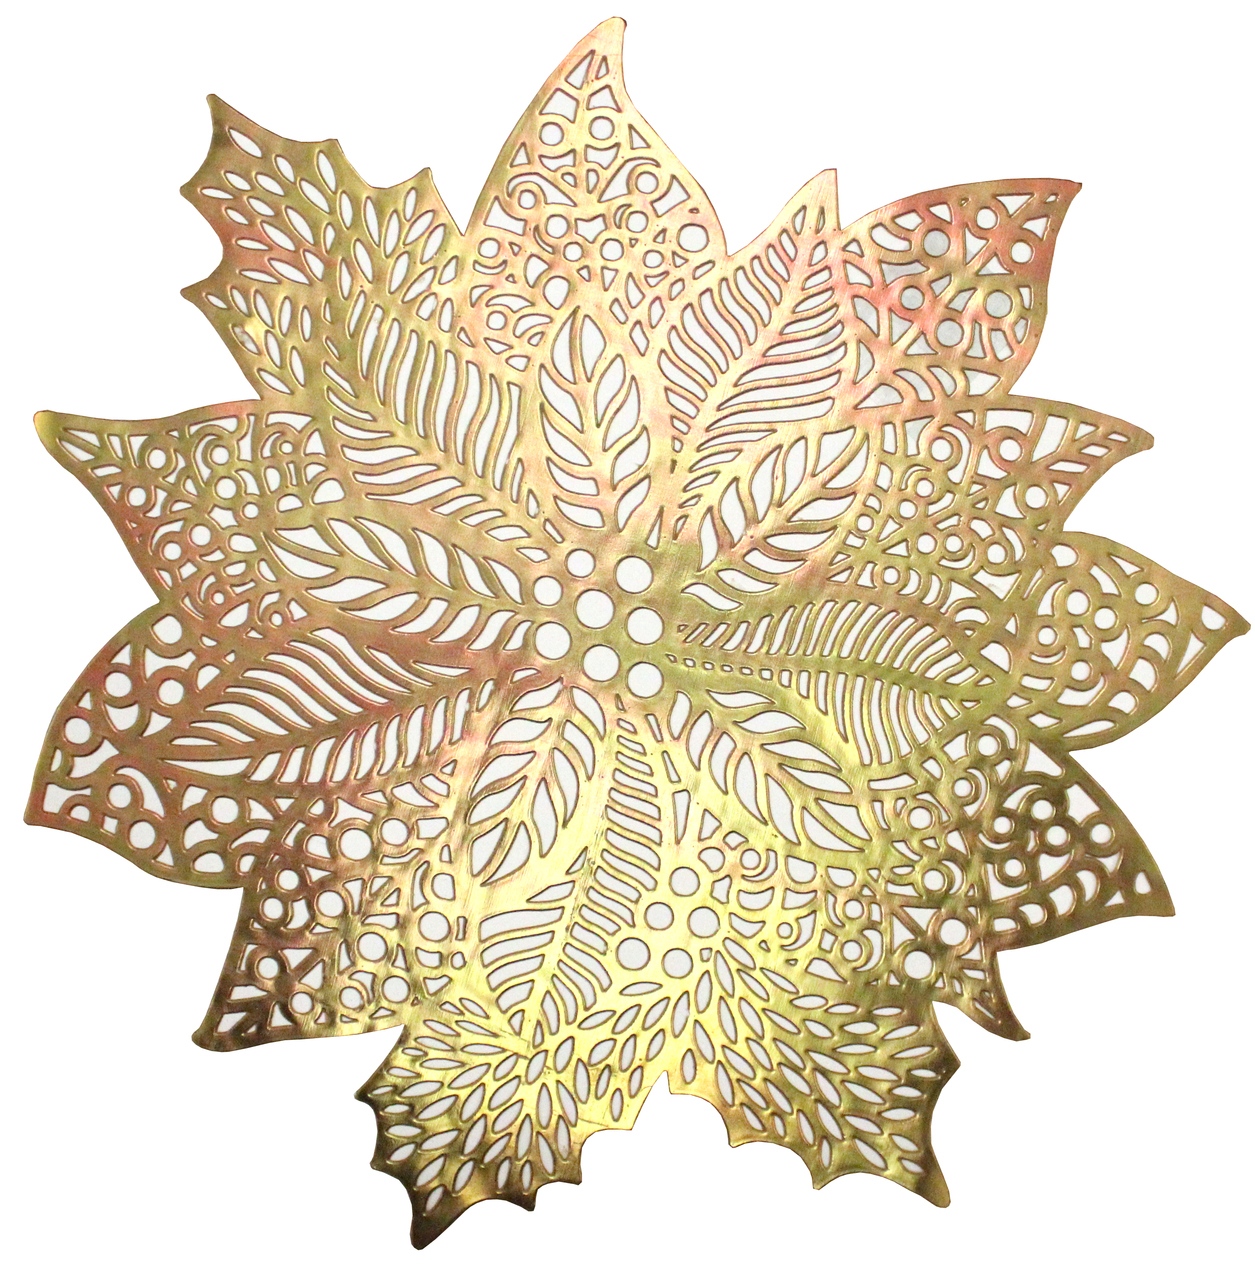 Amarillys Holiday Decorative Pvc Placemat Fl Design 15 Round Set Of 4 Gold Com